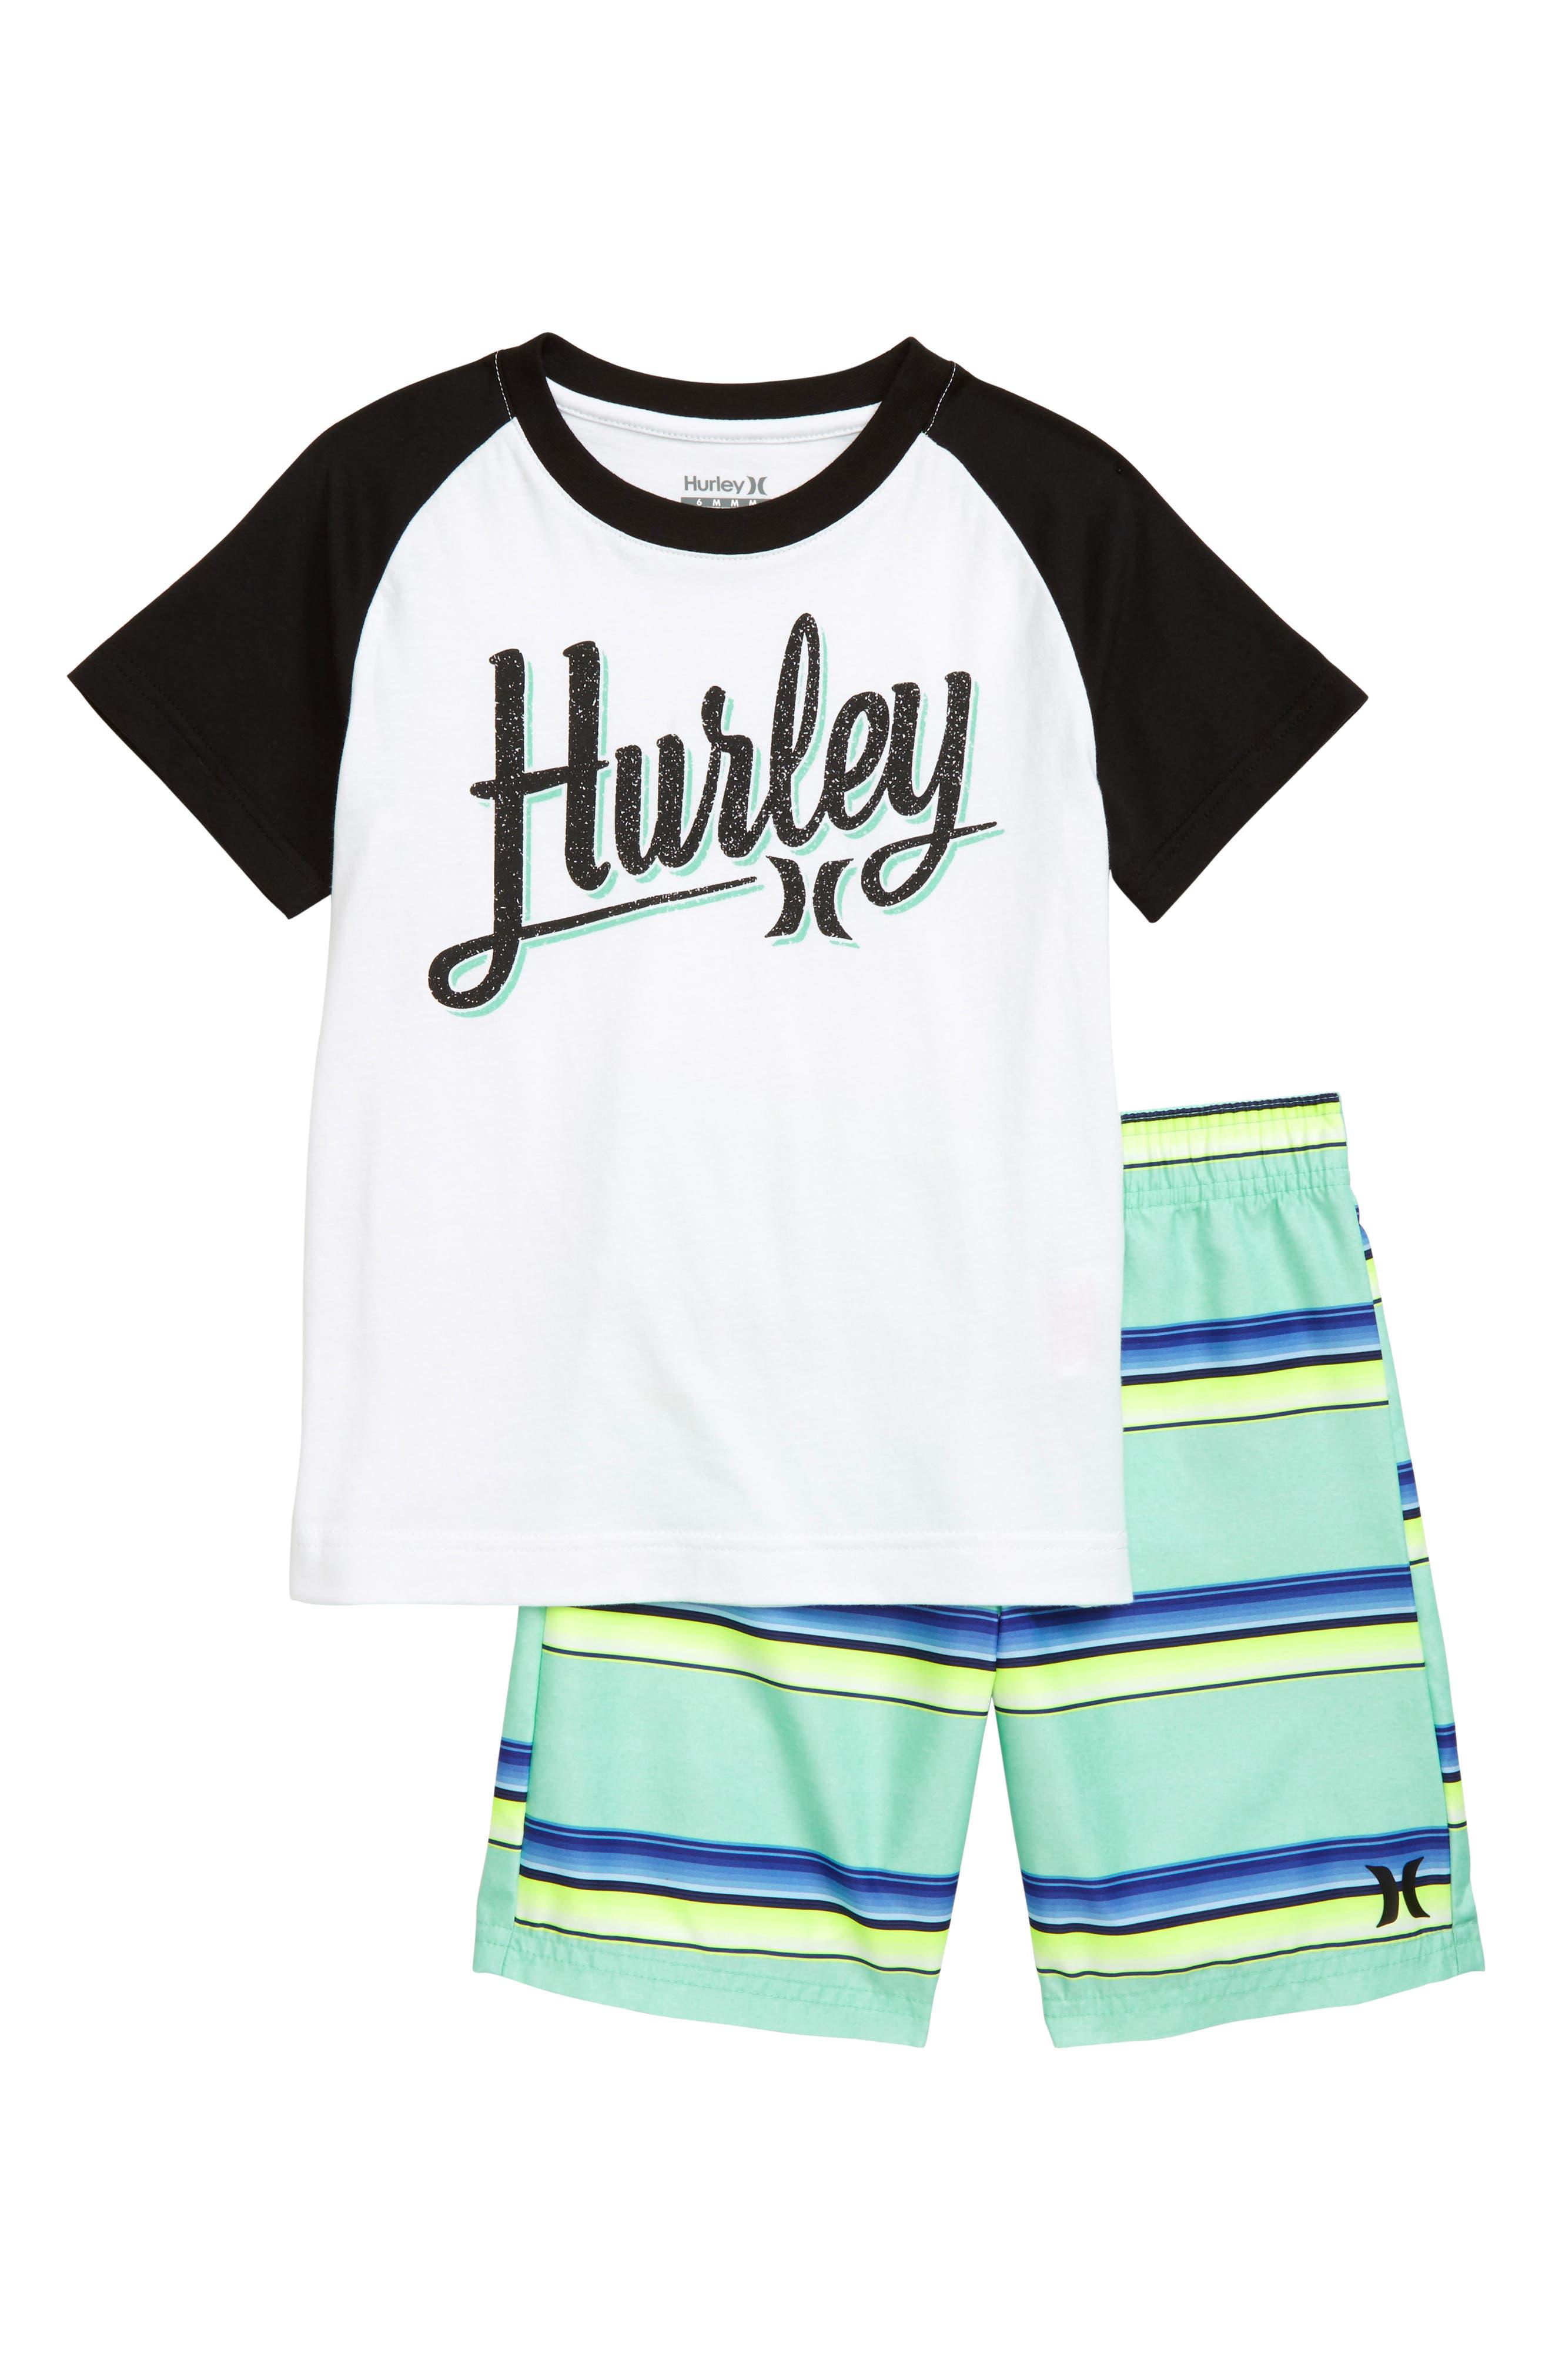 Toddler Boys Hurley Rainforest Shirt  Shorts Set